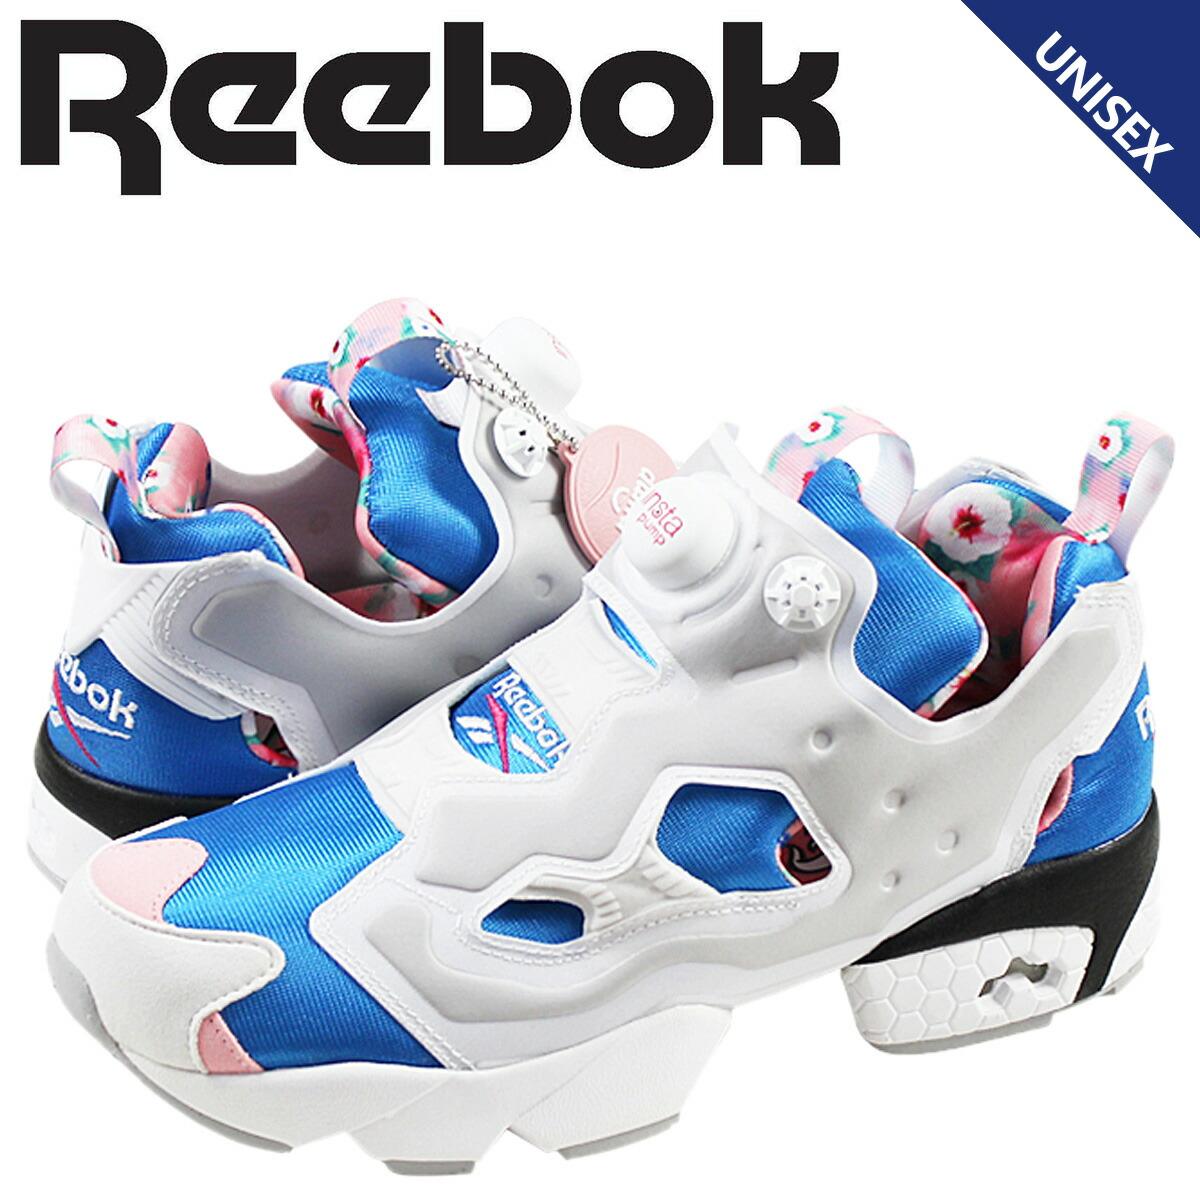 073413bcf8b1 reebok online shop cheap   OFF78% The Largest Catalog Discounts